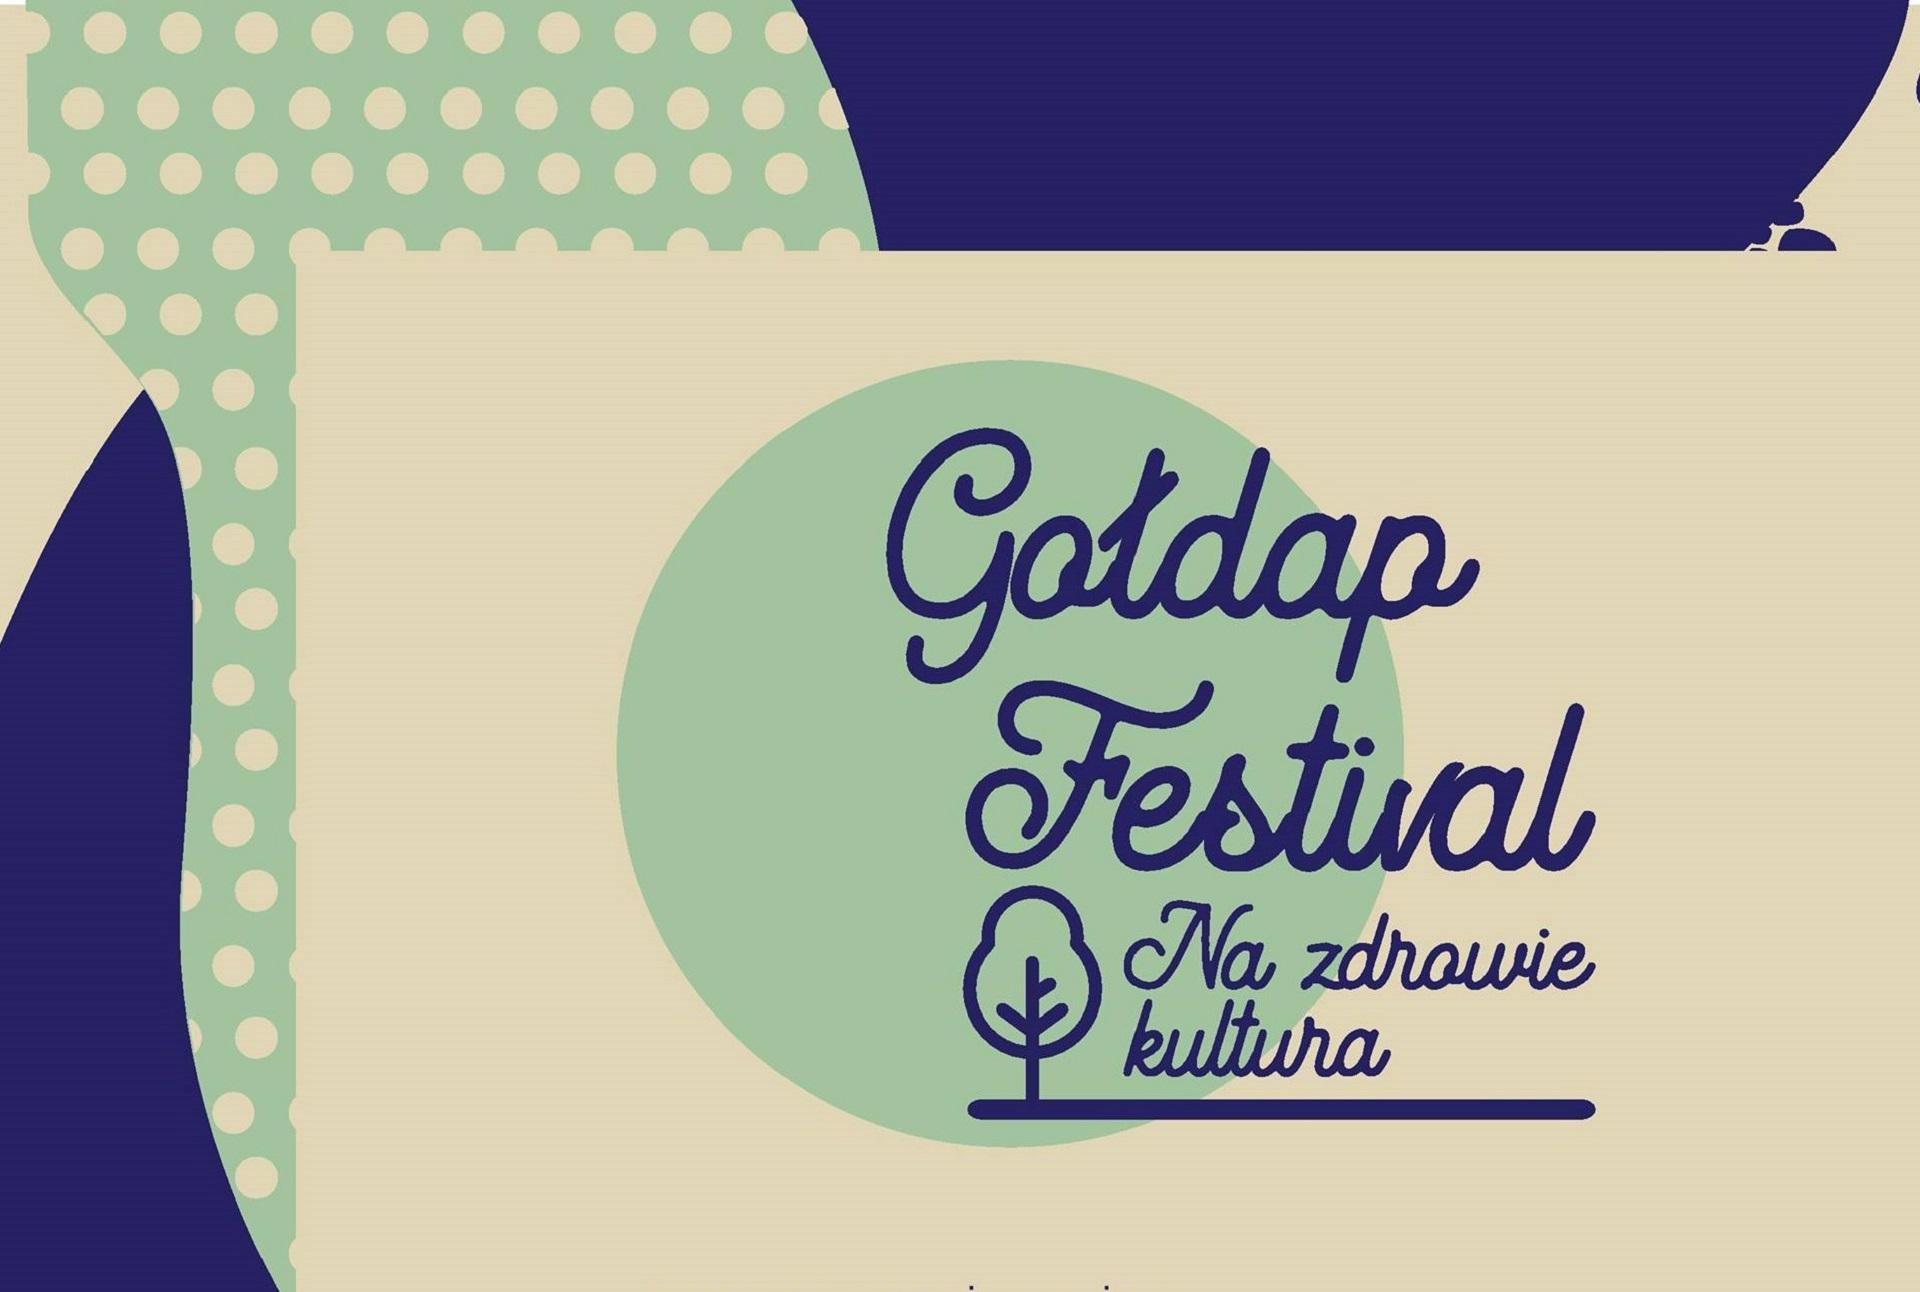 Goldap-festiwal-zdrowia-2019